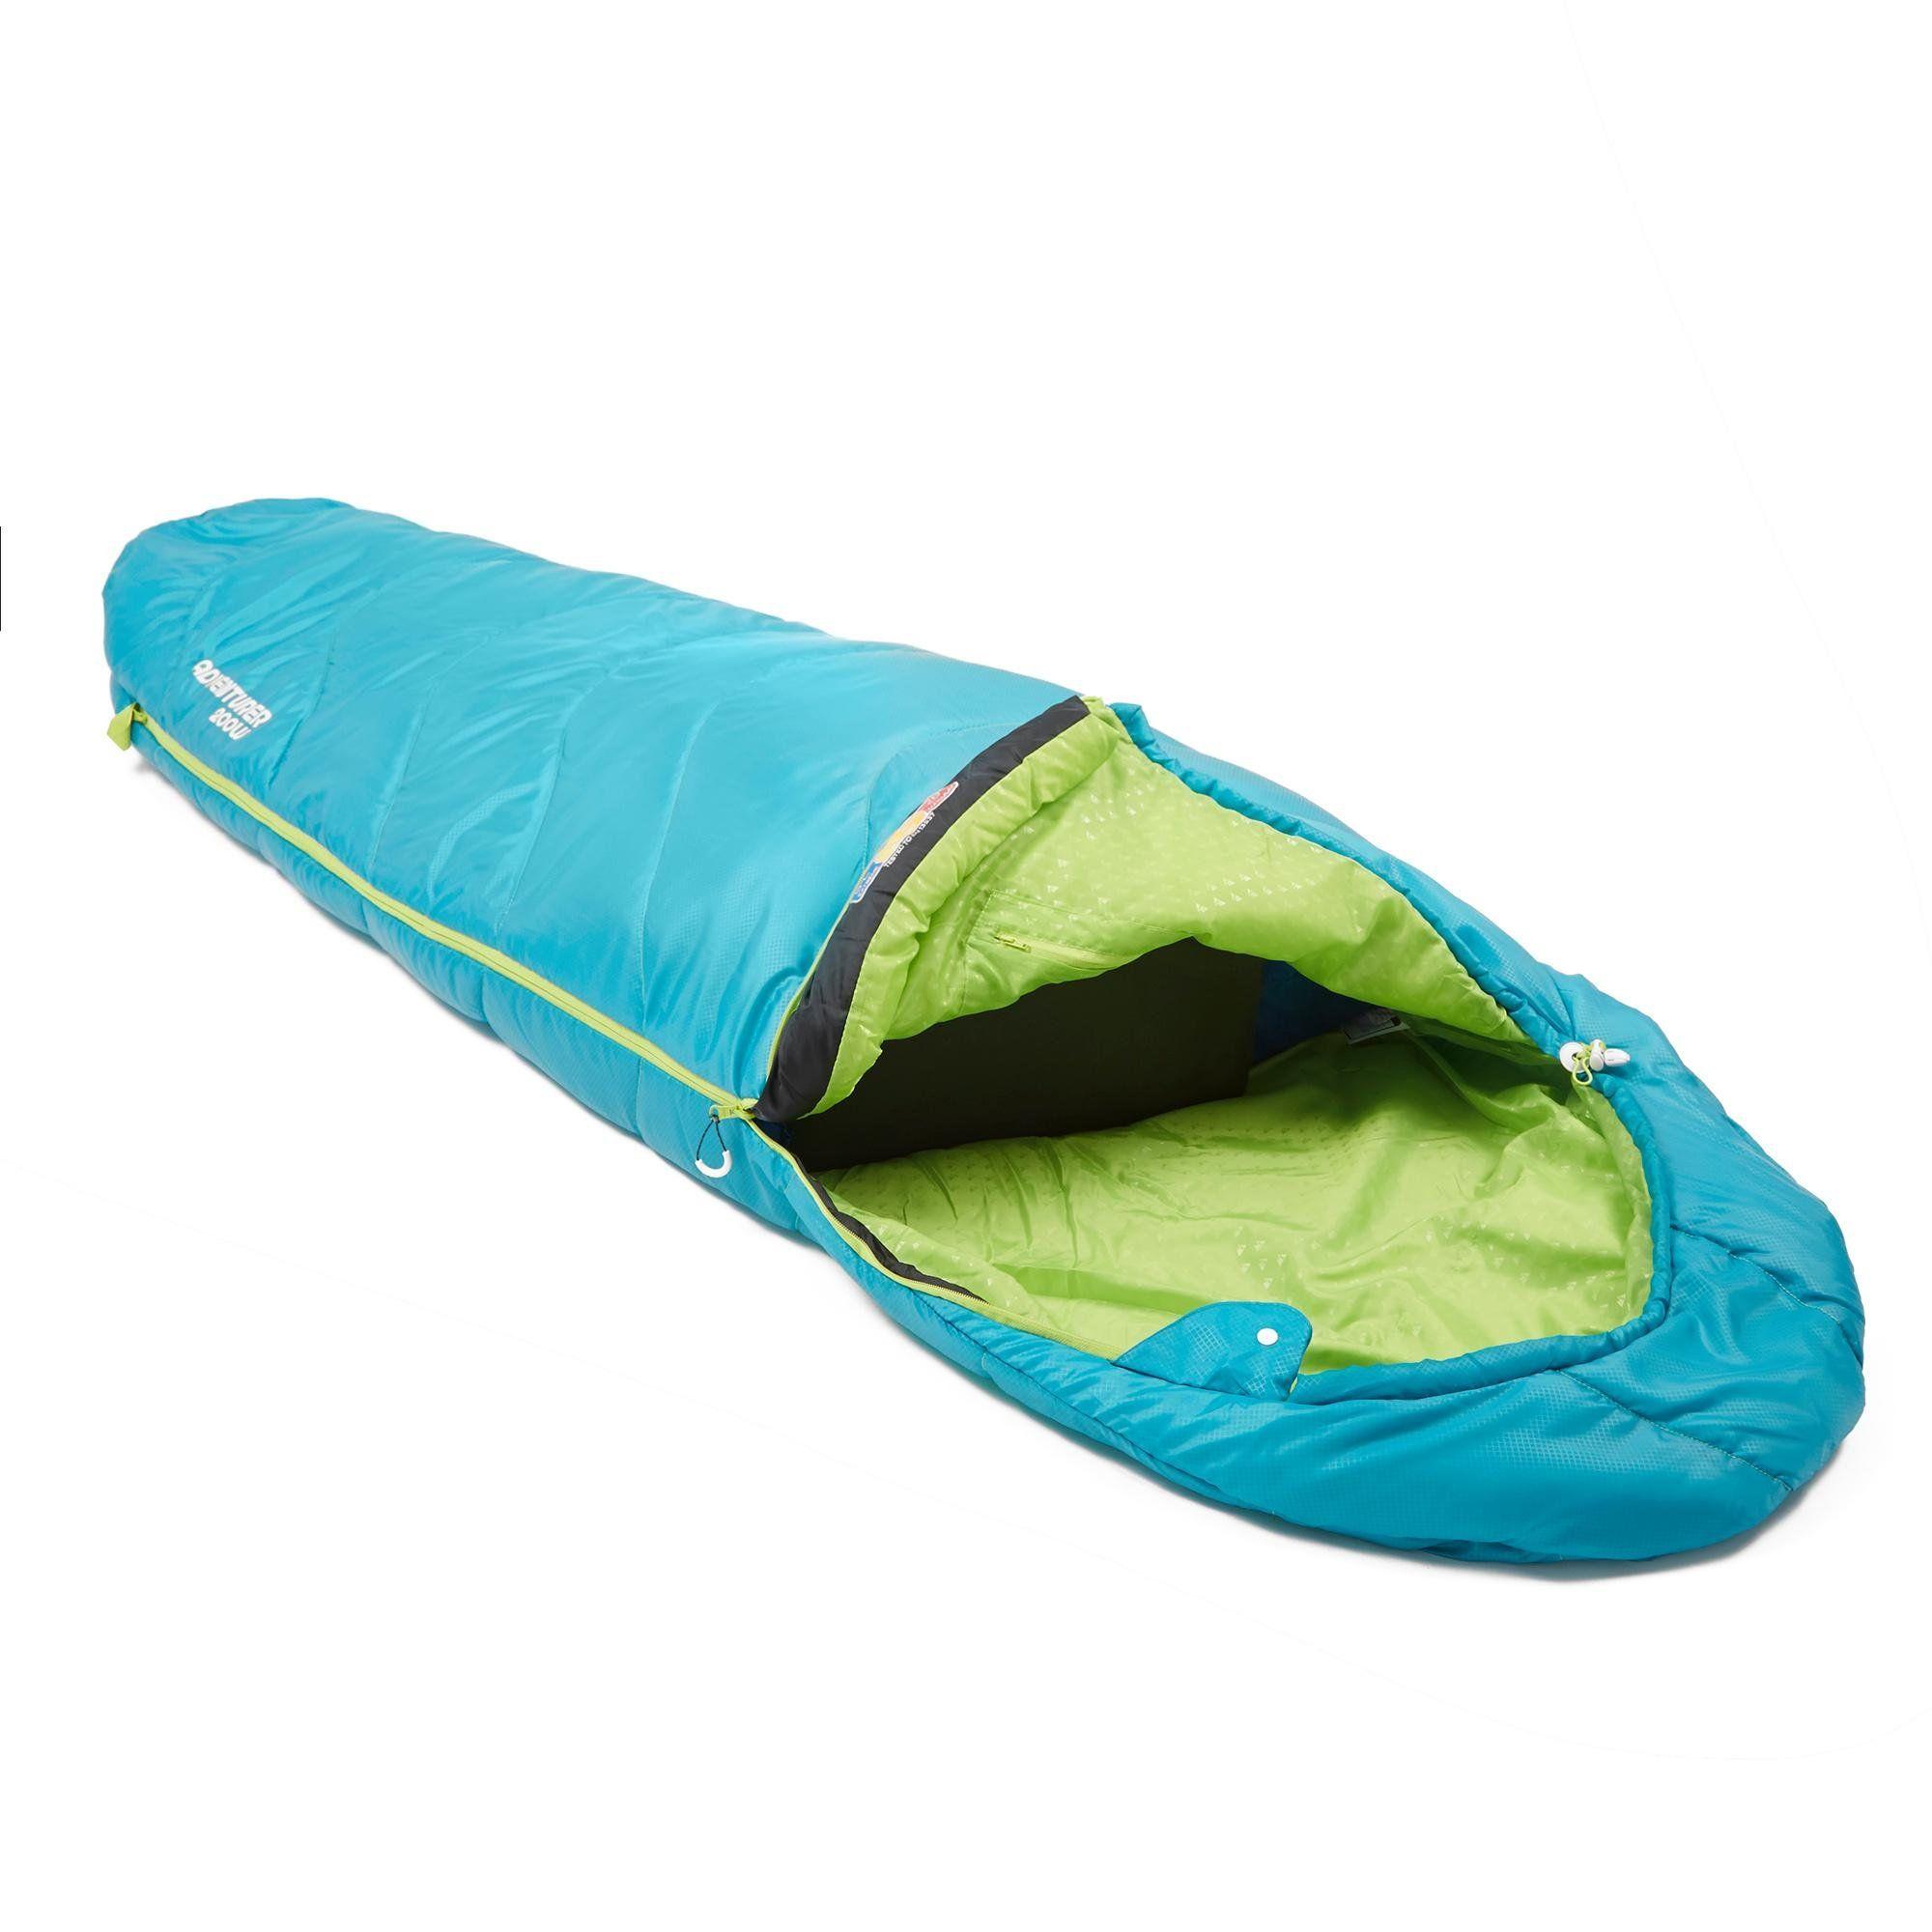 Eurohike Adventurer 200 Sleeping Bag